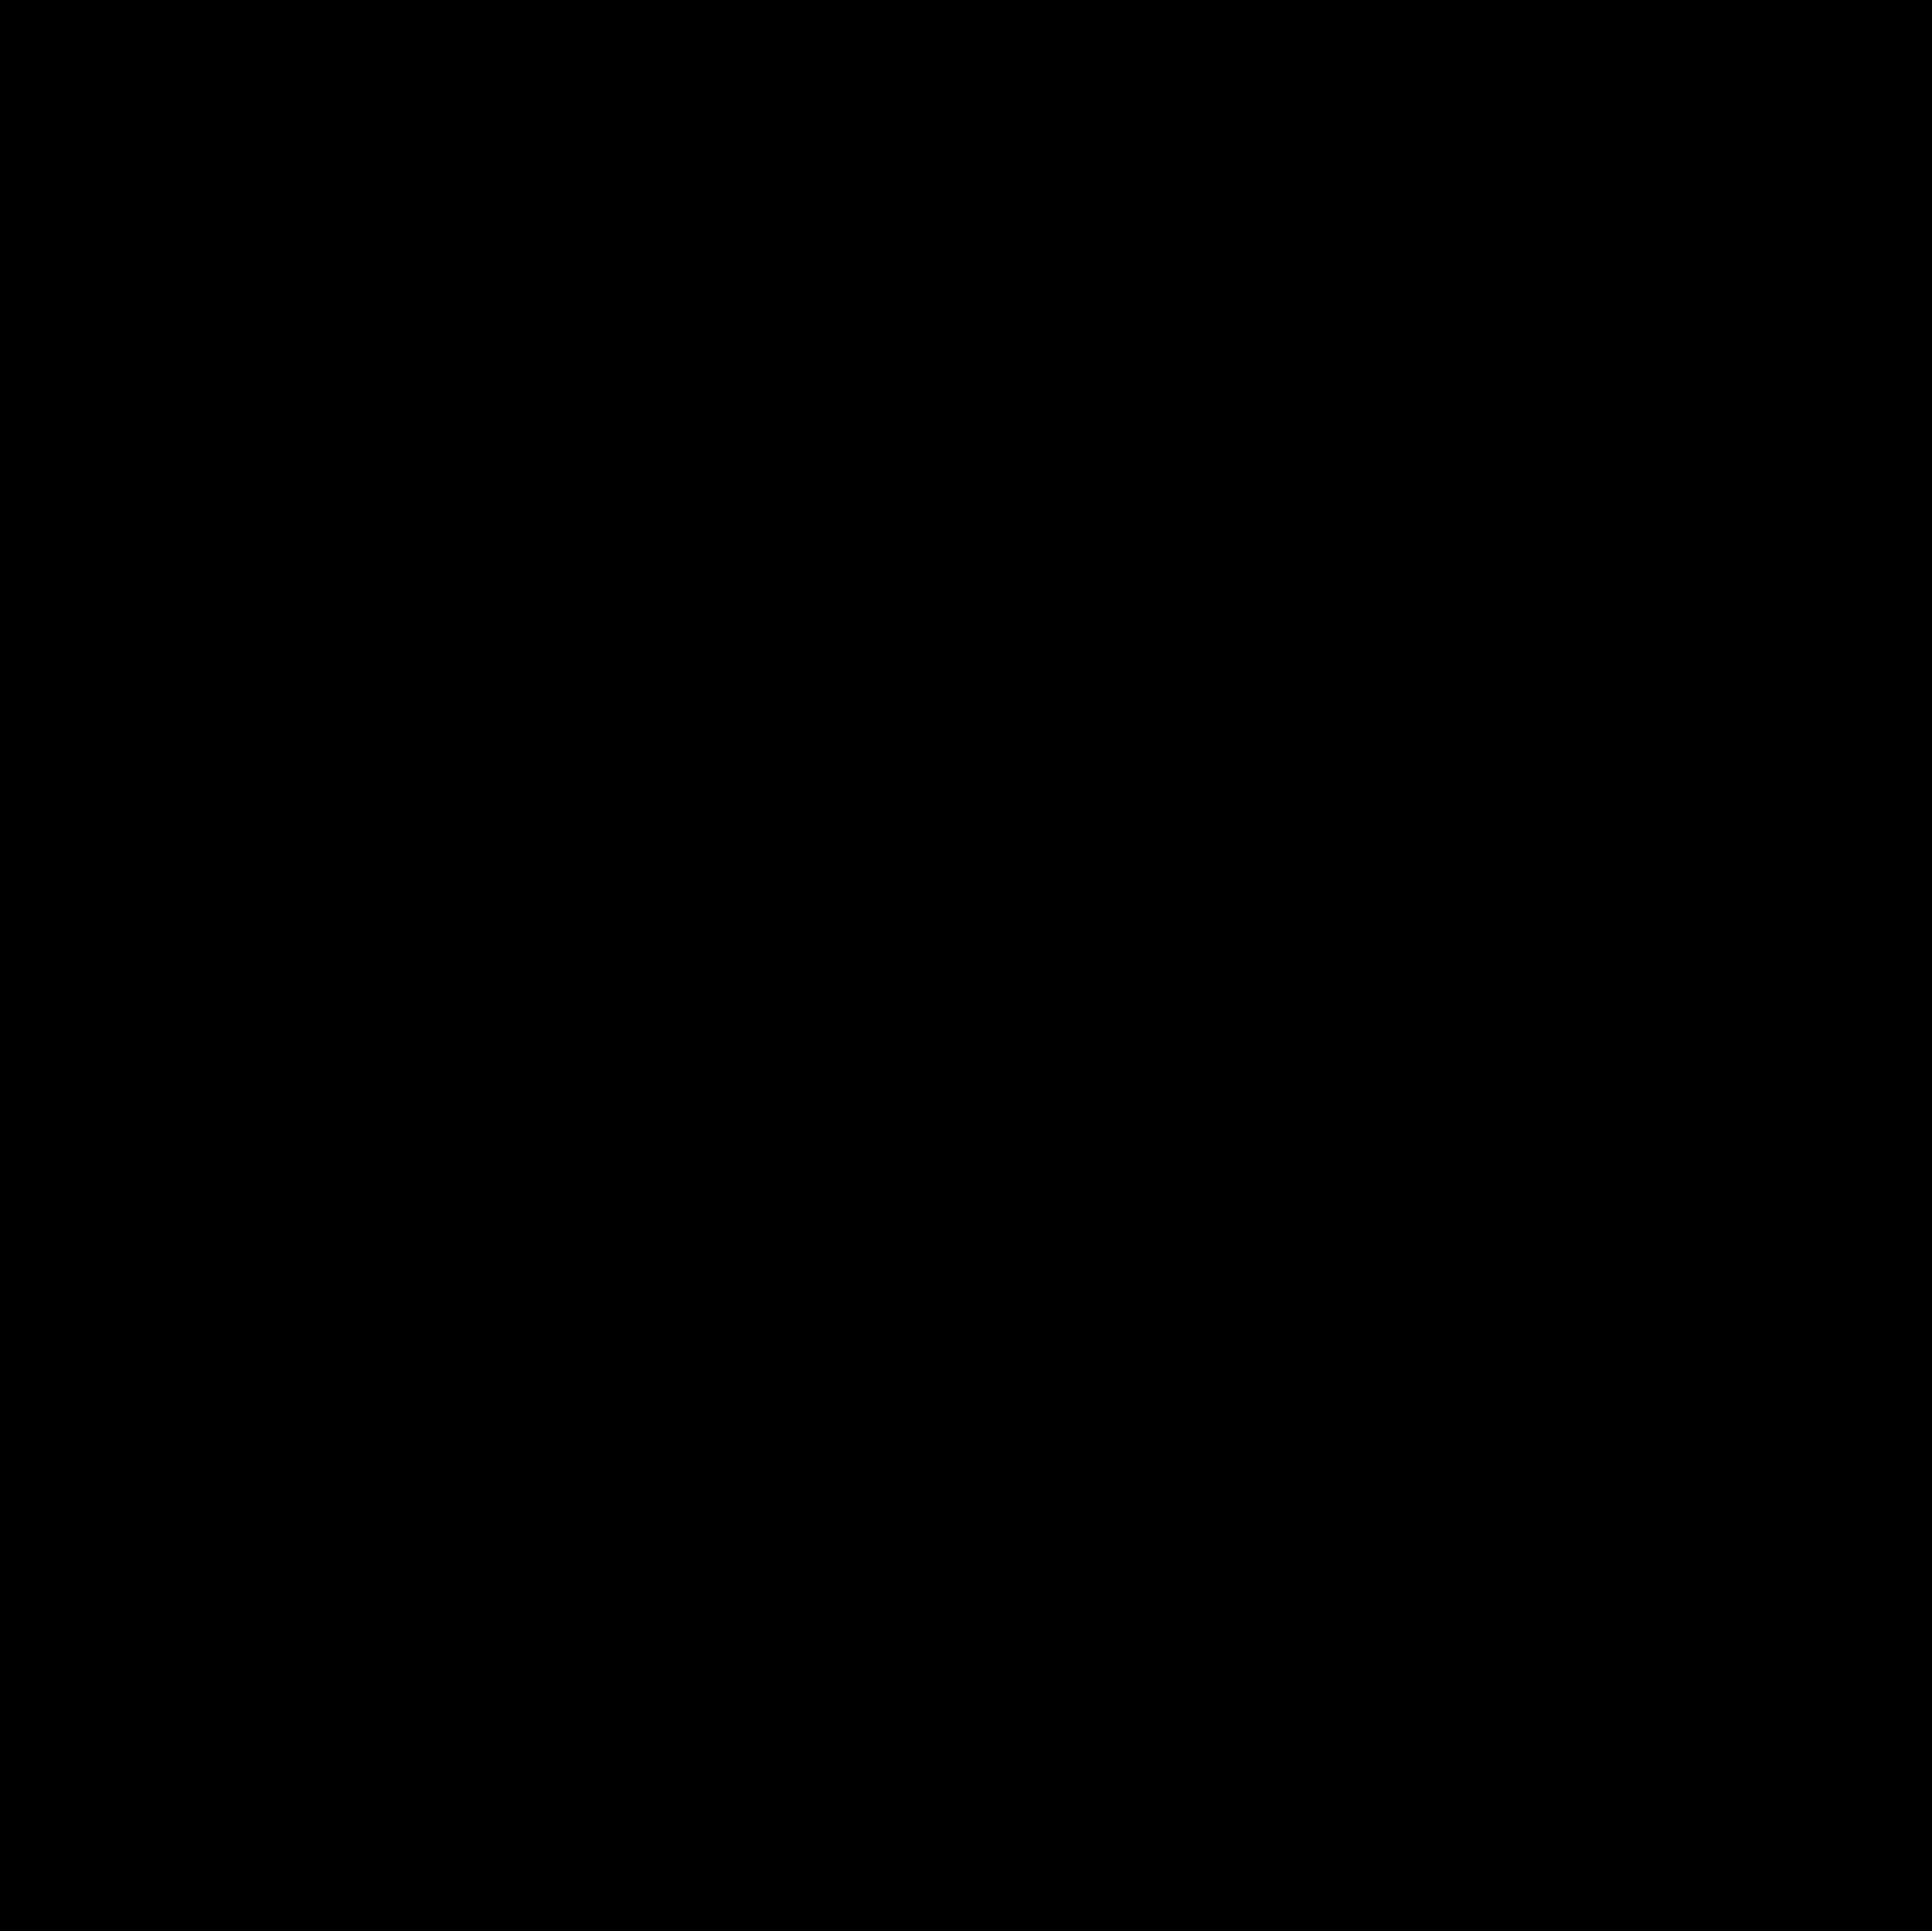 Pseudodox logo-03.png